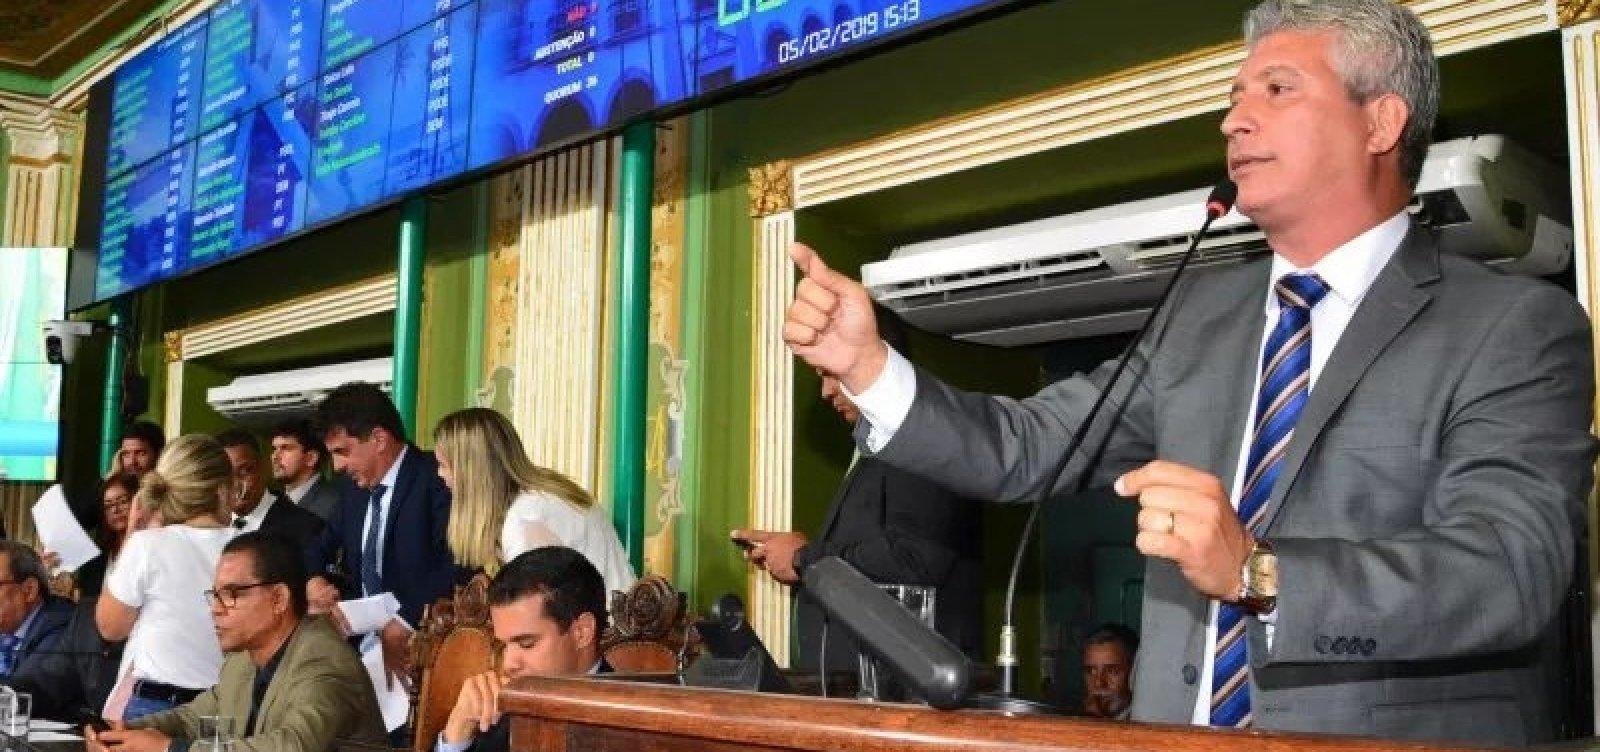 [Carballal entrega vice-liderança na Câmara de Salvador após Neto vetar seu projeto]